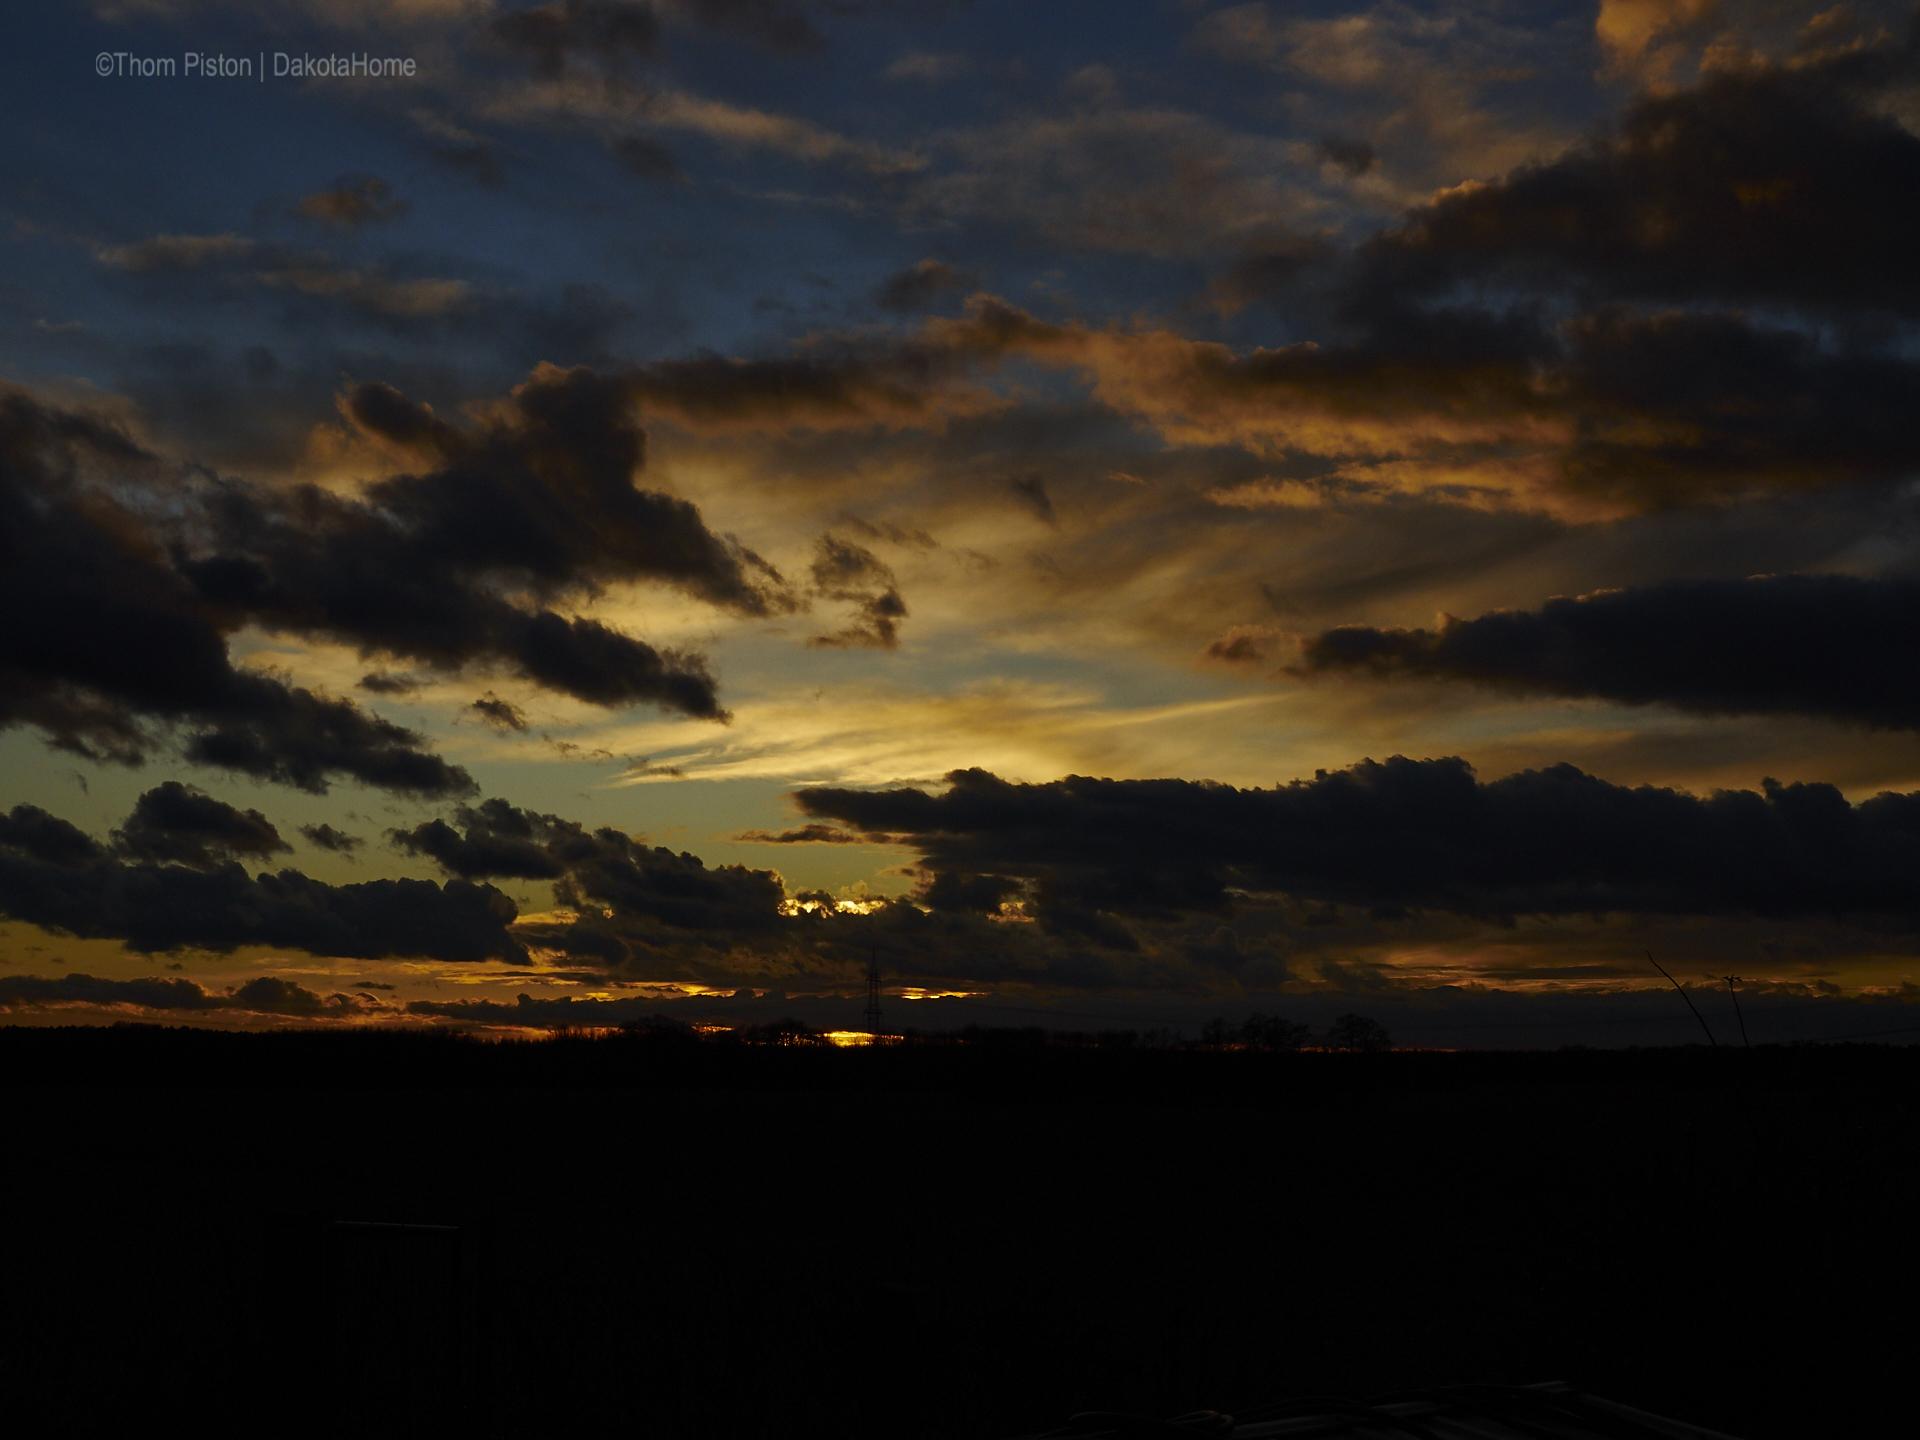 Sonnenuntergang anfang Januar at Dakota Home